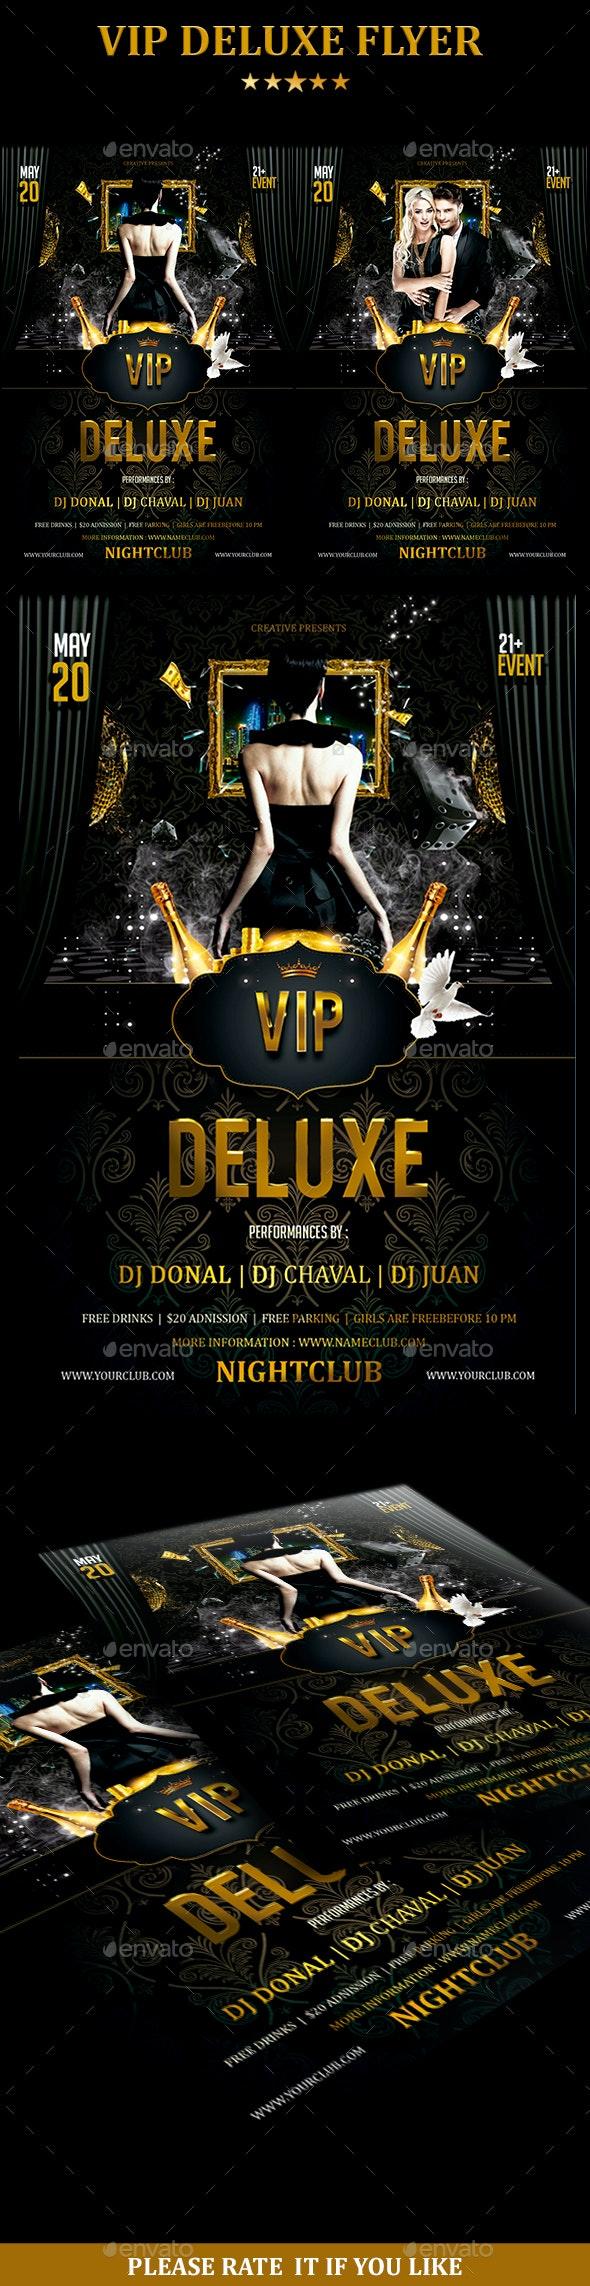 VIP Deluxe Flyer - Flyers Print Templates